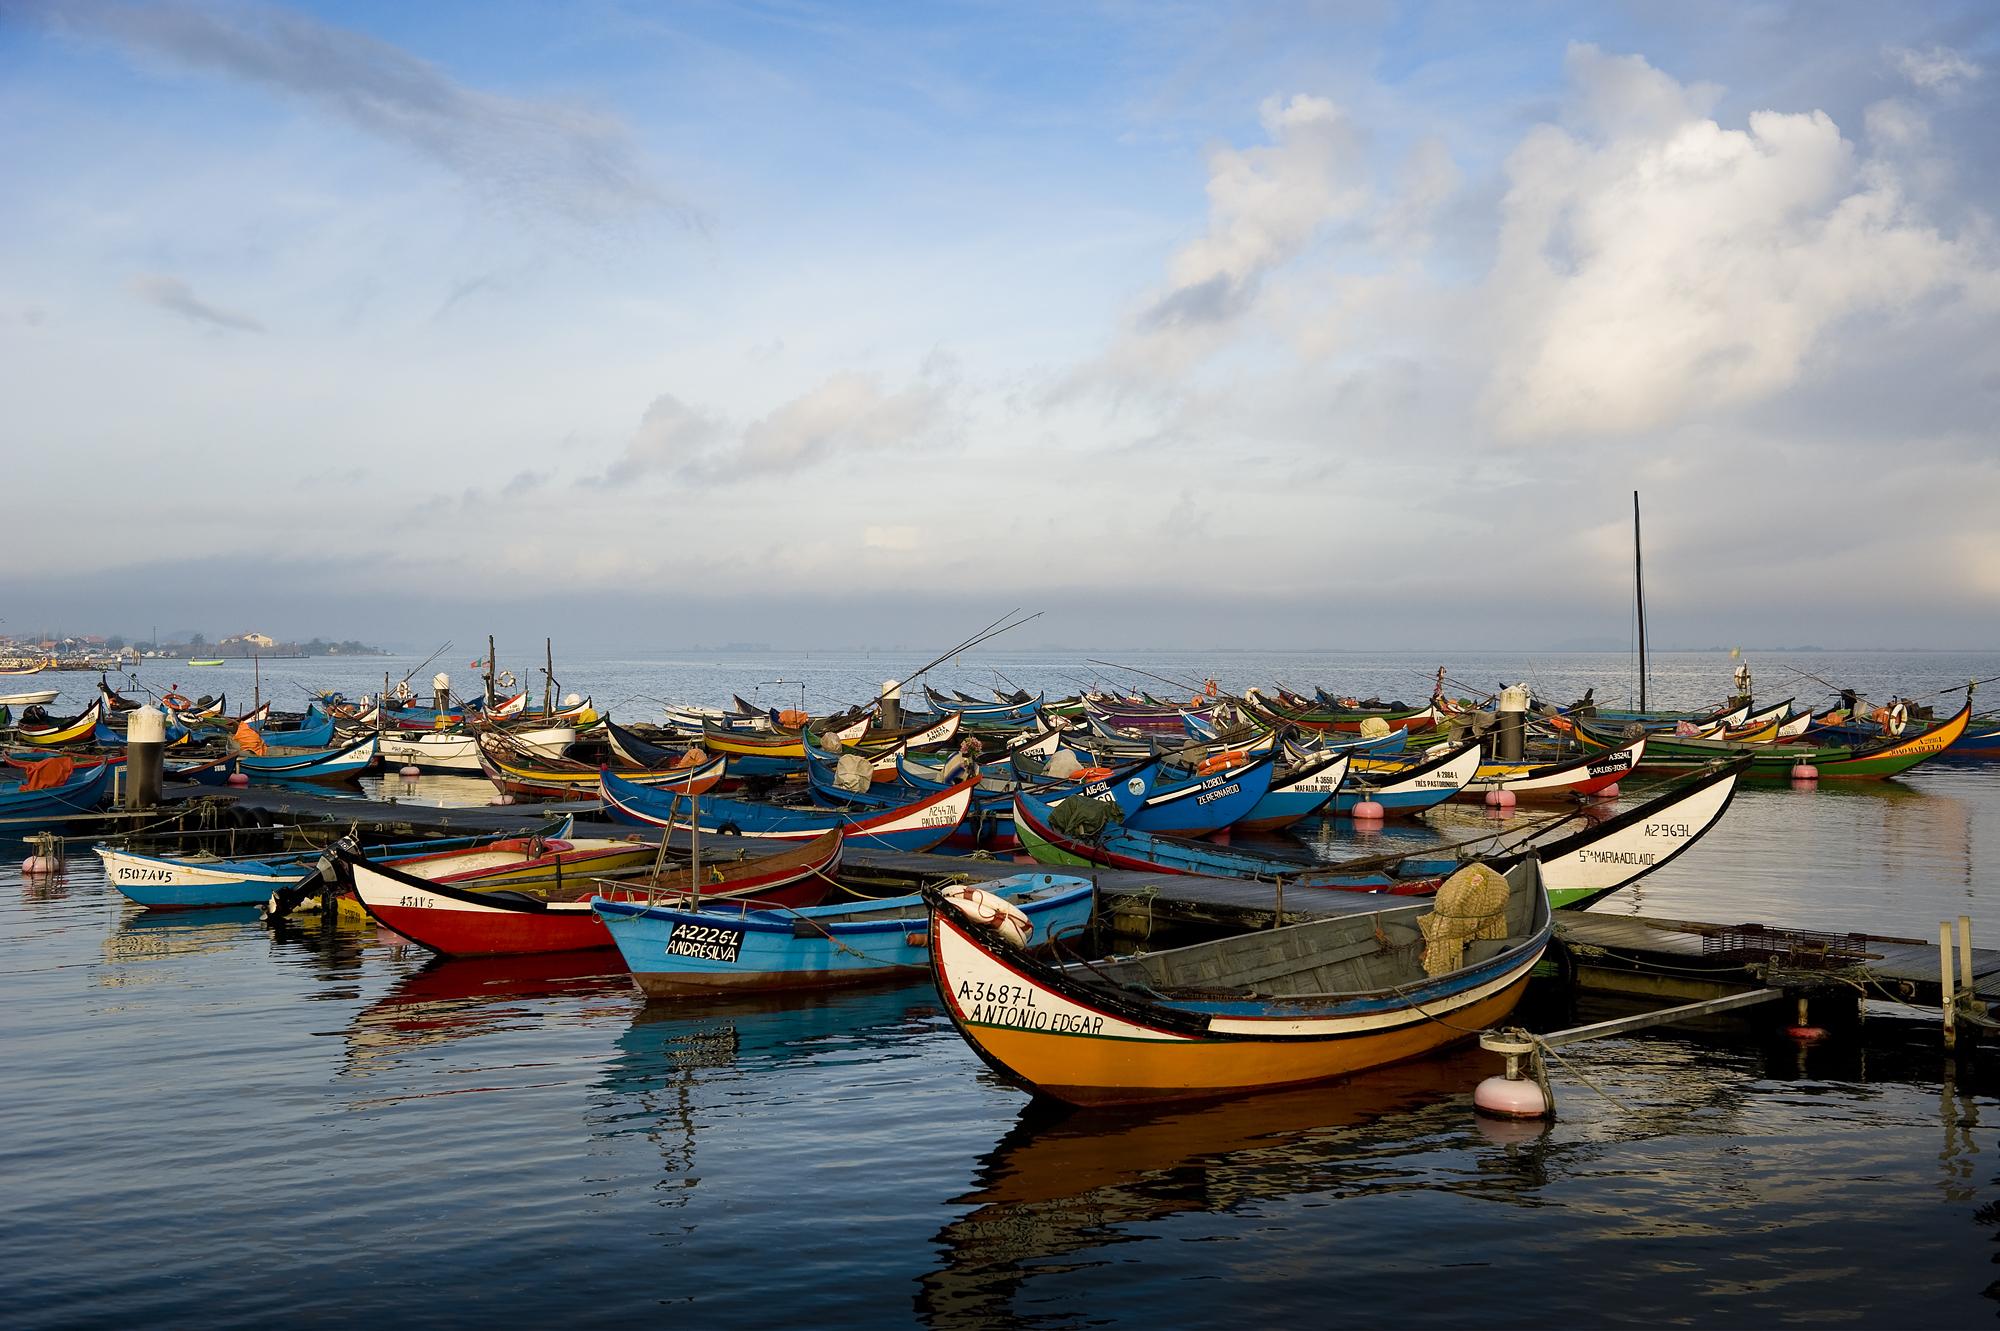 EØS-midlene støtter prosjekter som skal bevare Portugals rike kystkultur. Foto: Den norske ambassaden i Lisboa